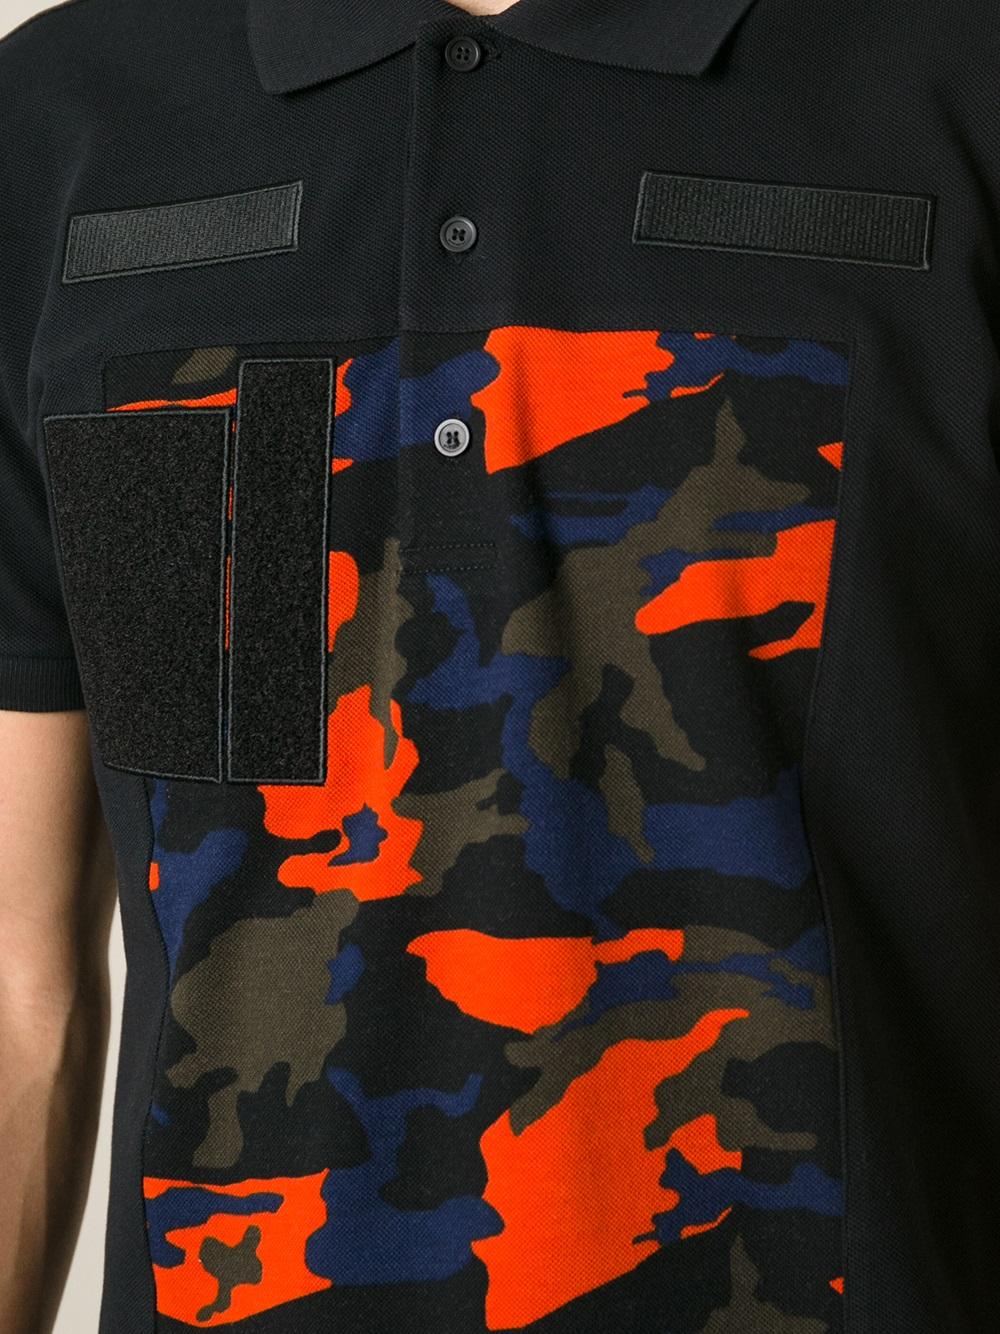 978722ba4 Givenchy Camo Print Polo Shirt in Black for Men - Lyst